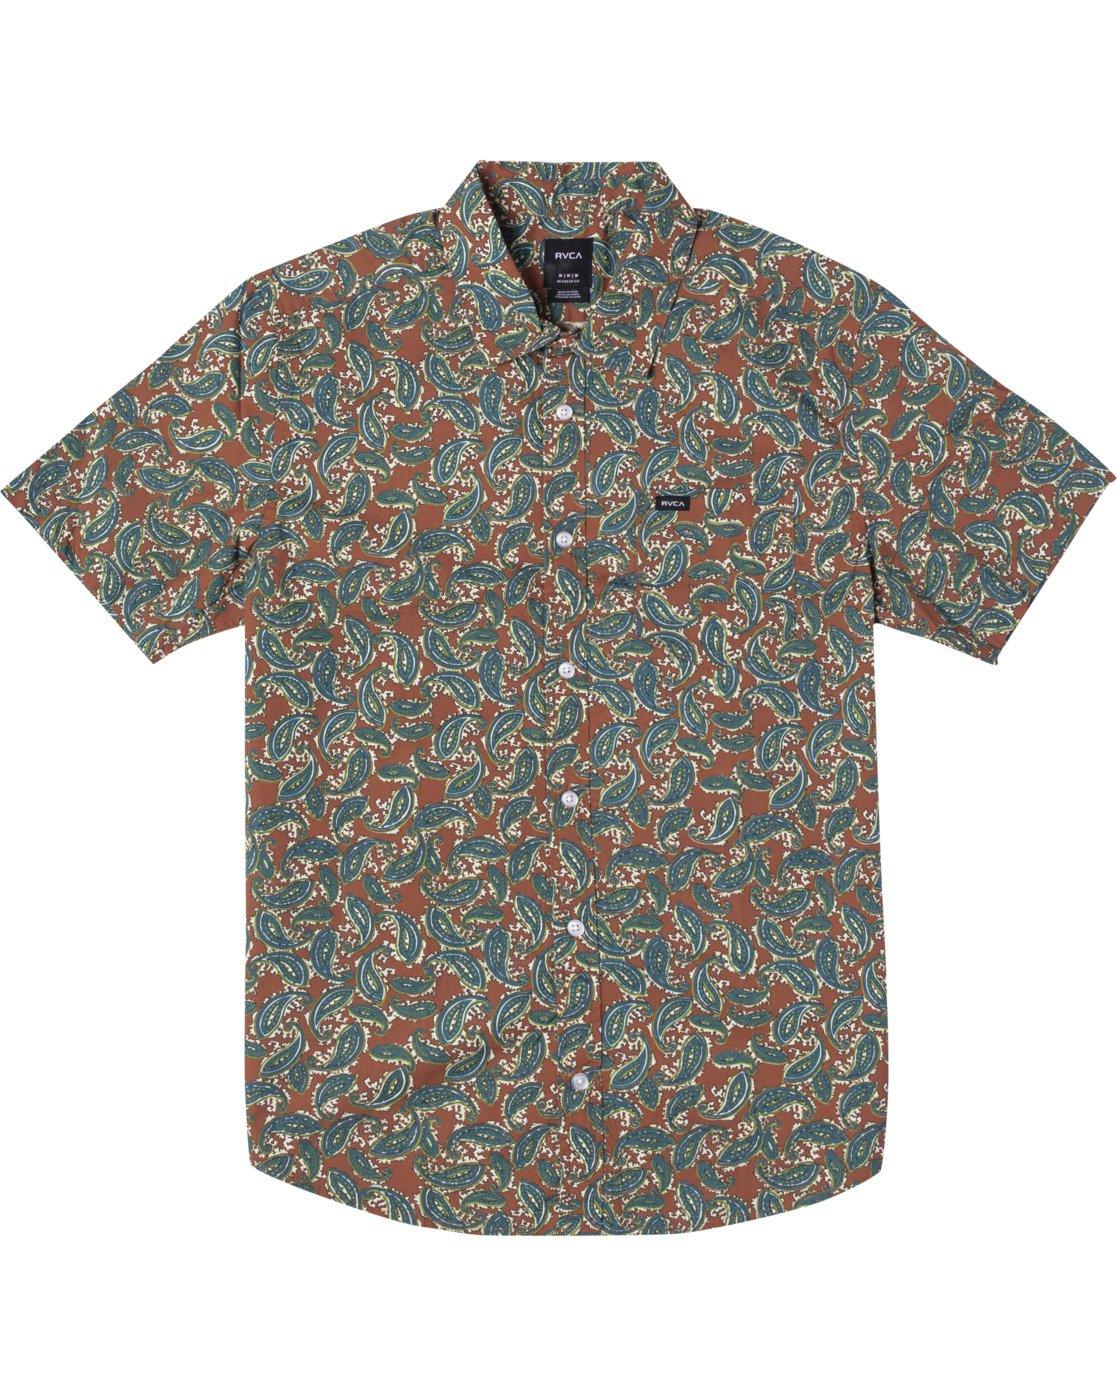 0 Mind Flower Paisley Short Sleeve Shirt Brown AVYWT00199 RVCA